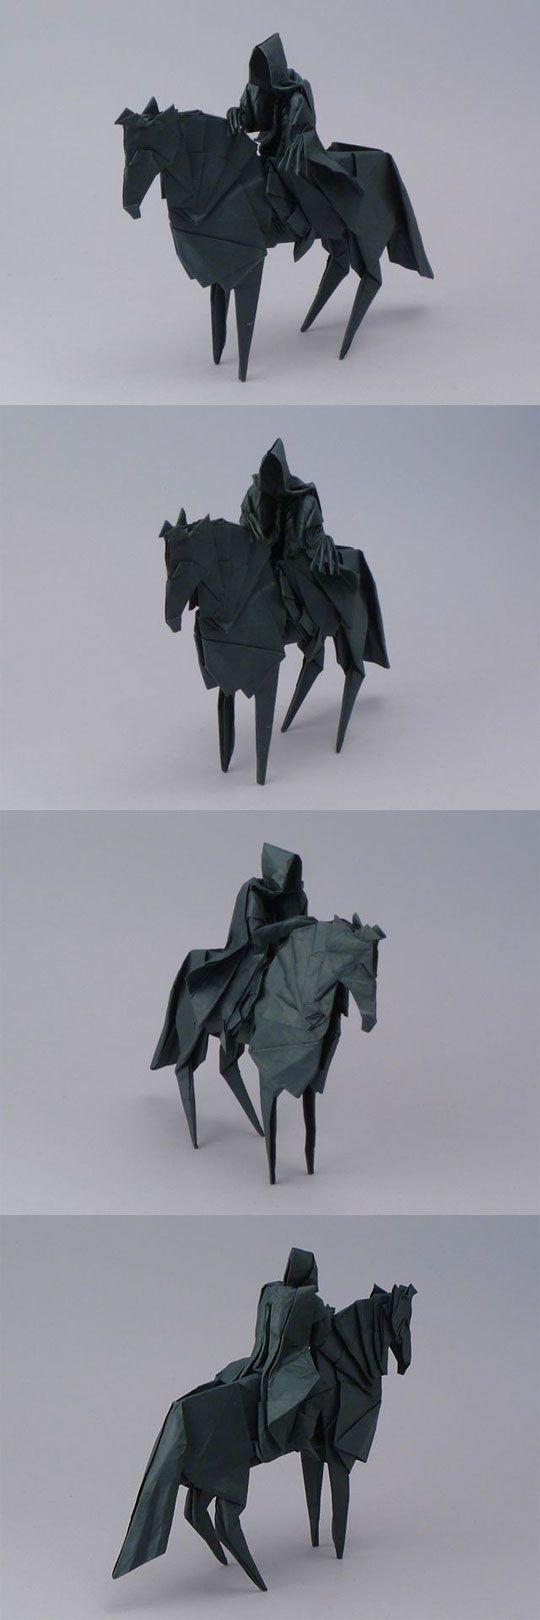 Origami the interesting art of folding paper to make shapes origami 24 jeuxipadfo Images